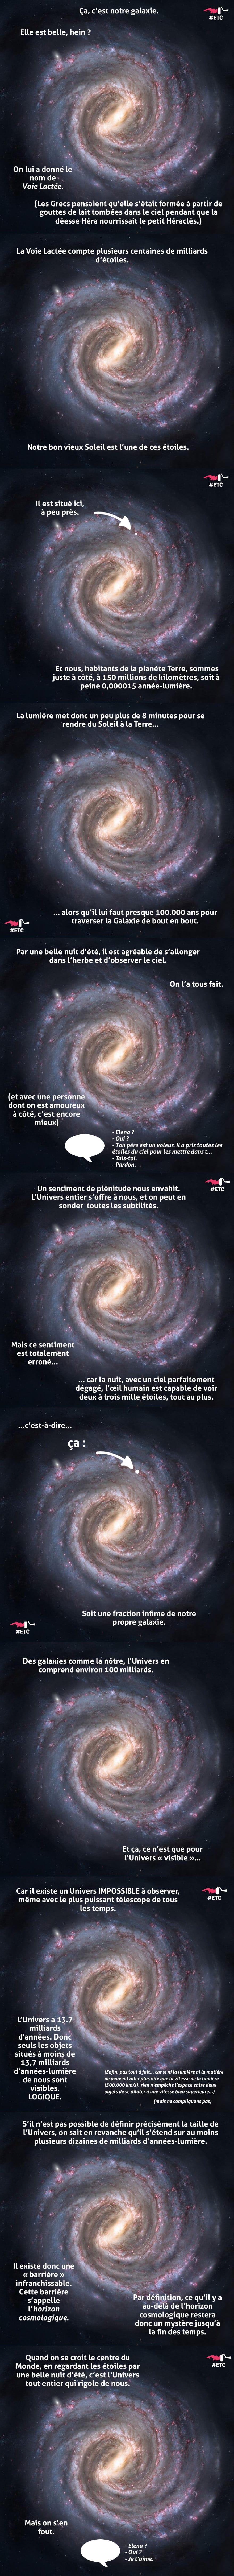 notre-galaxie